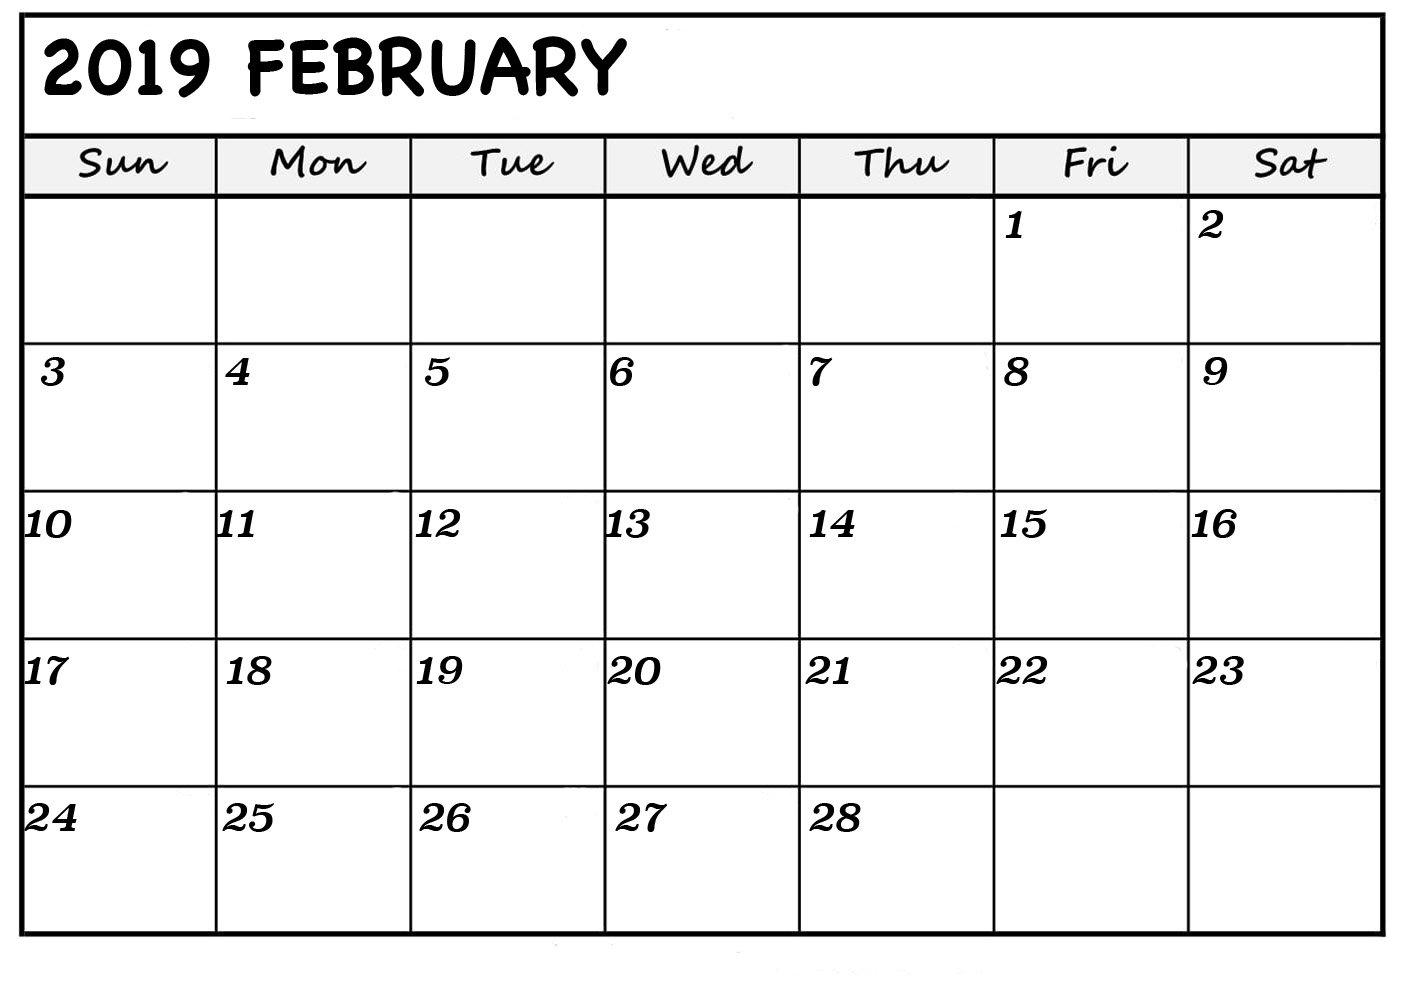 Free February 2019 Printable Calendar Templates - Calendar Calender You Can Edit